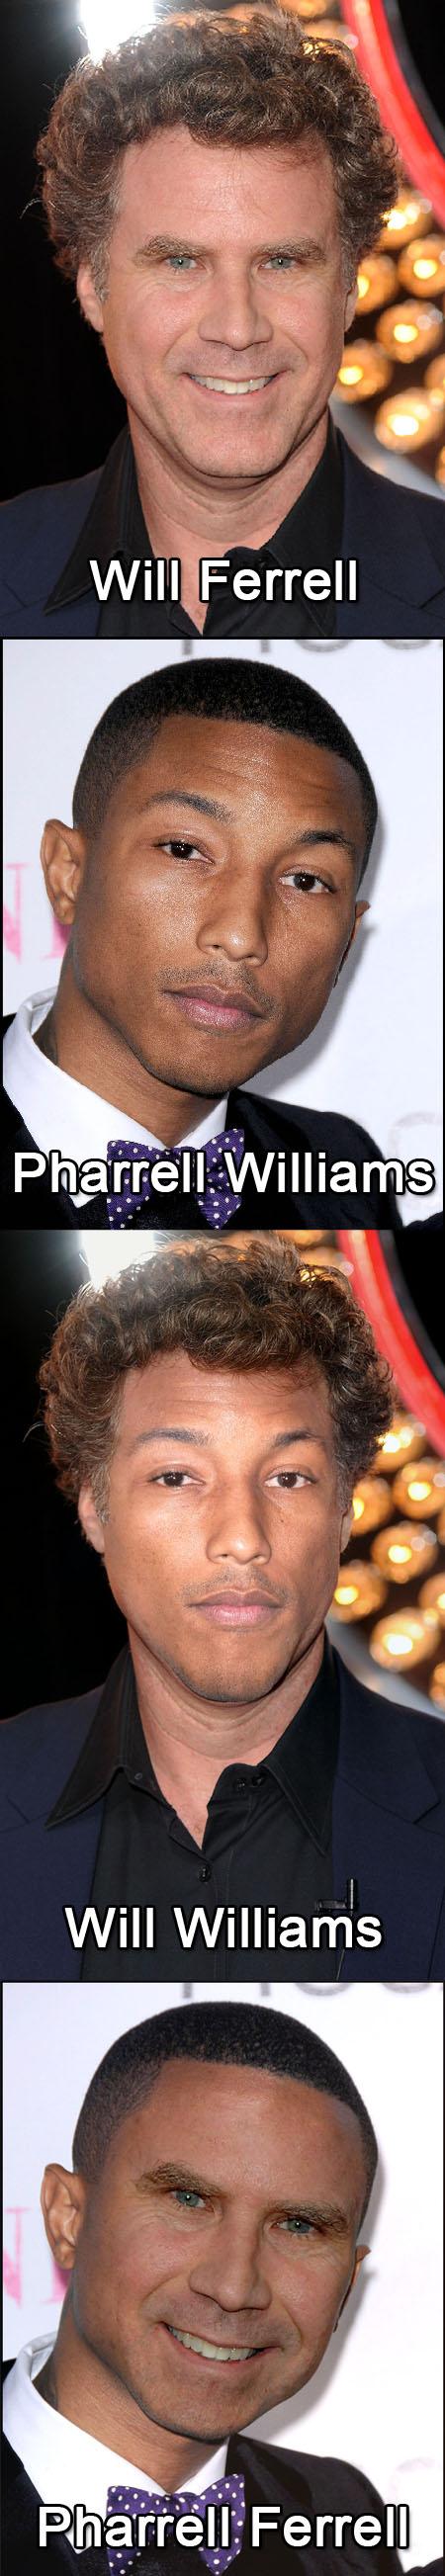 will ferrell pharrell